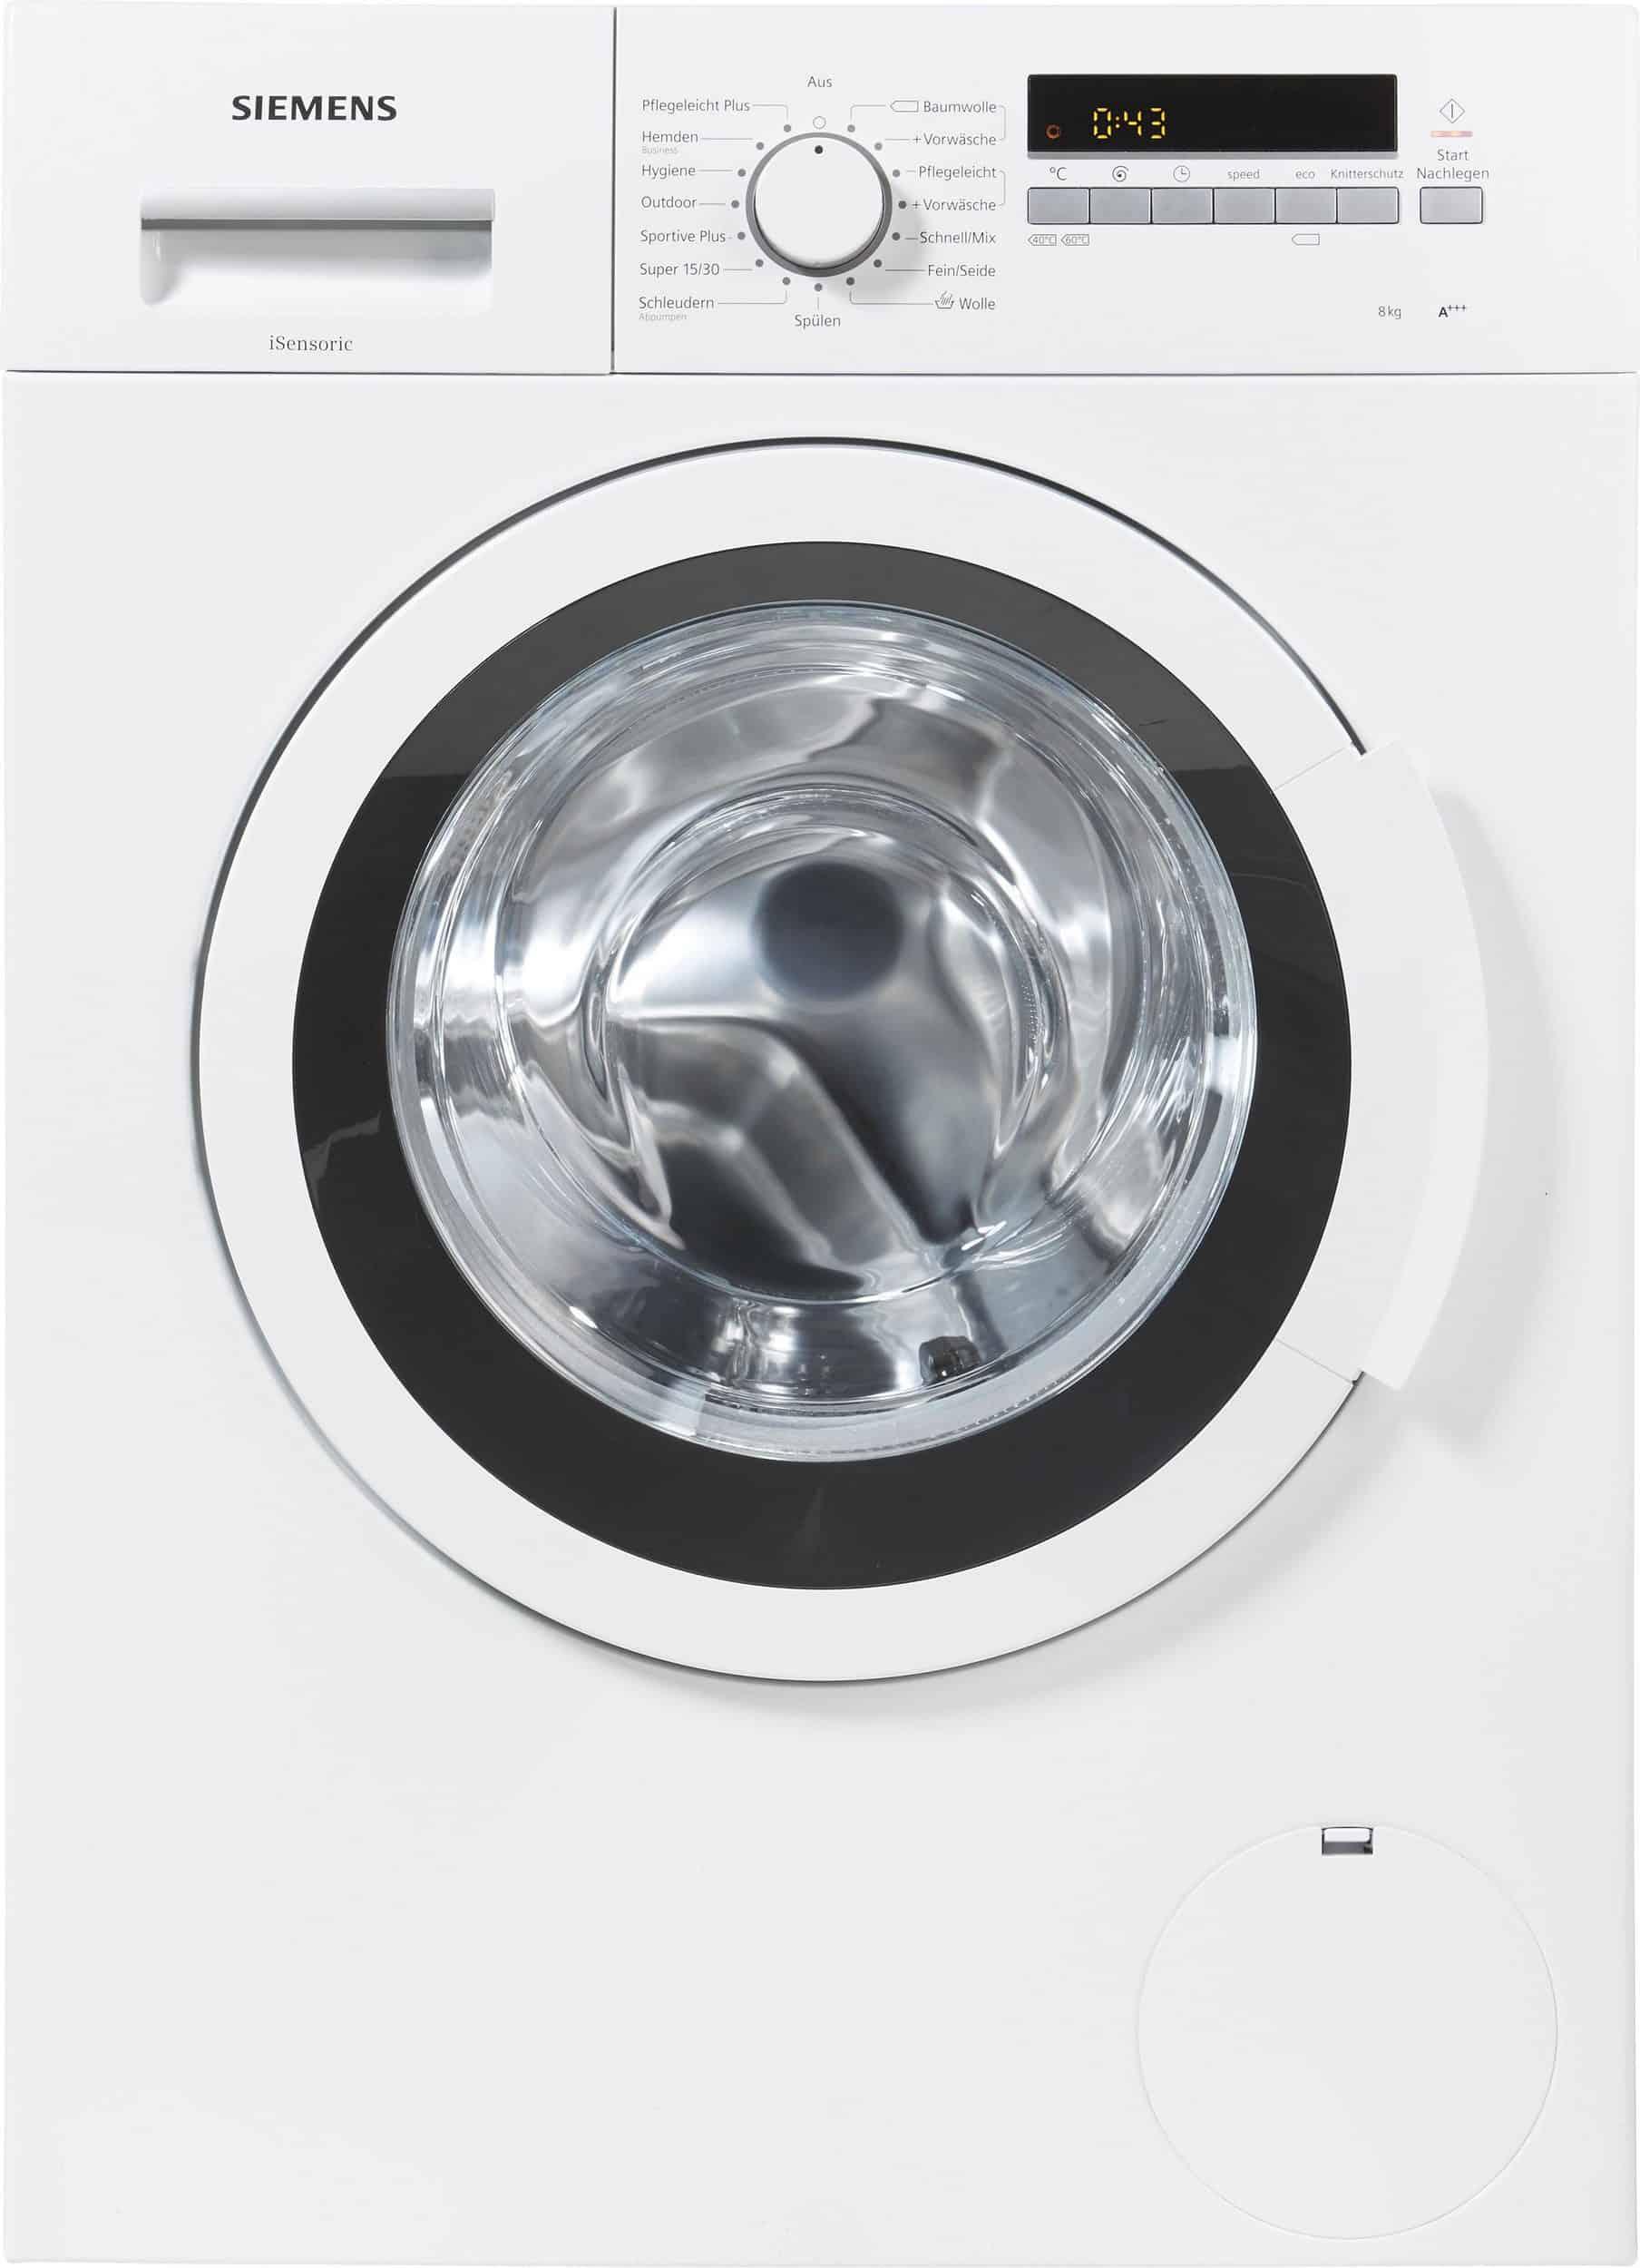 Siemens Wm14k2eco Waschmaschine Im Test Februar 2019